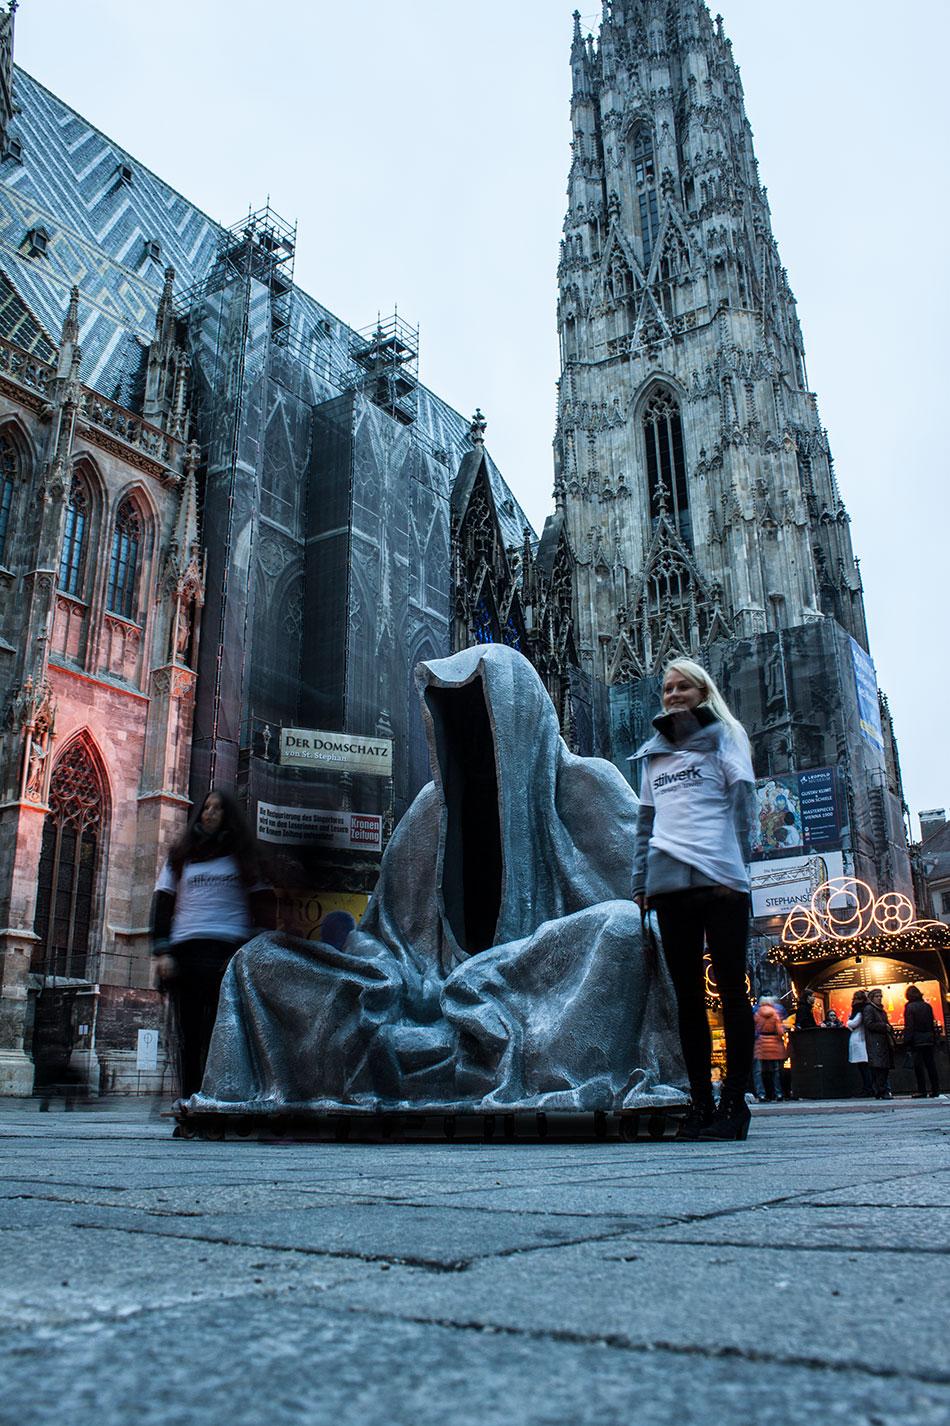 stilwerk-wien-design-tower-art-antique-fair-vienna-wikam-guardians-of-time-manfred-kielnhofer-duekouba-designkooperative-public-art-sculpture-transport-design-tour-vienna-5012